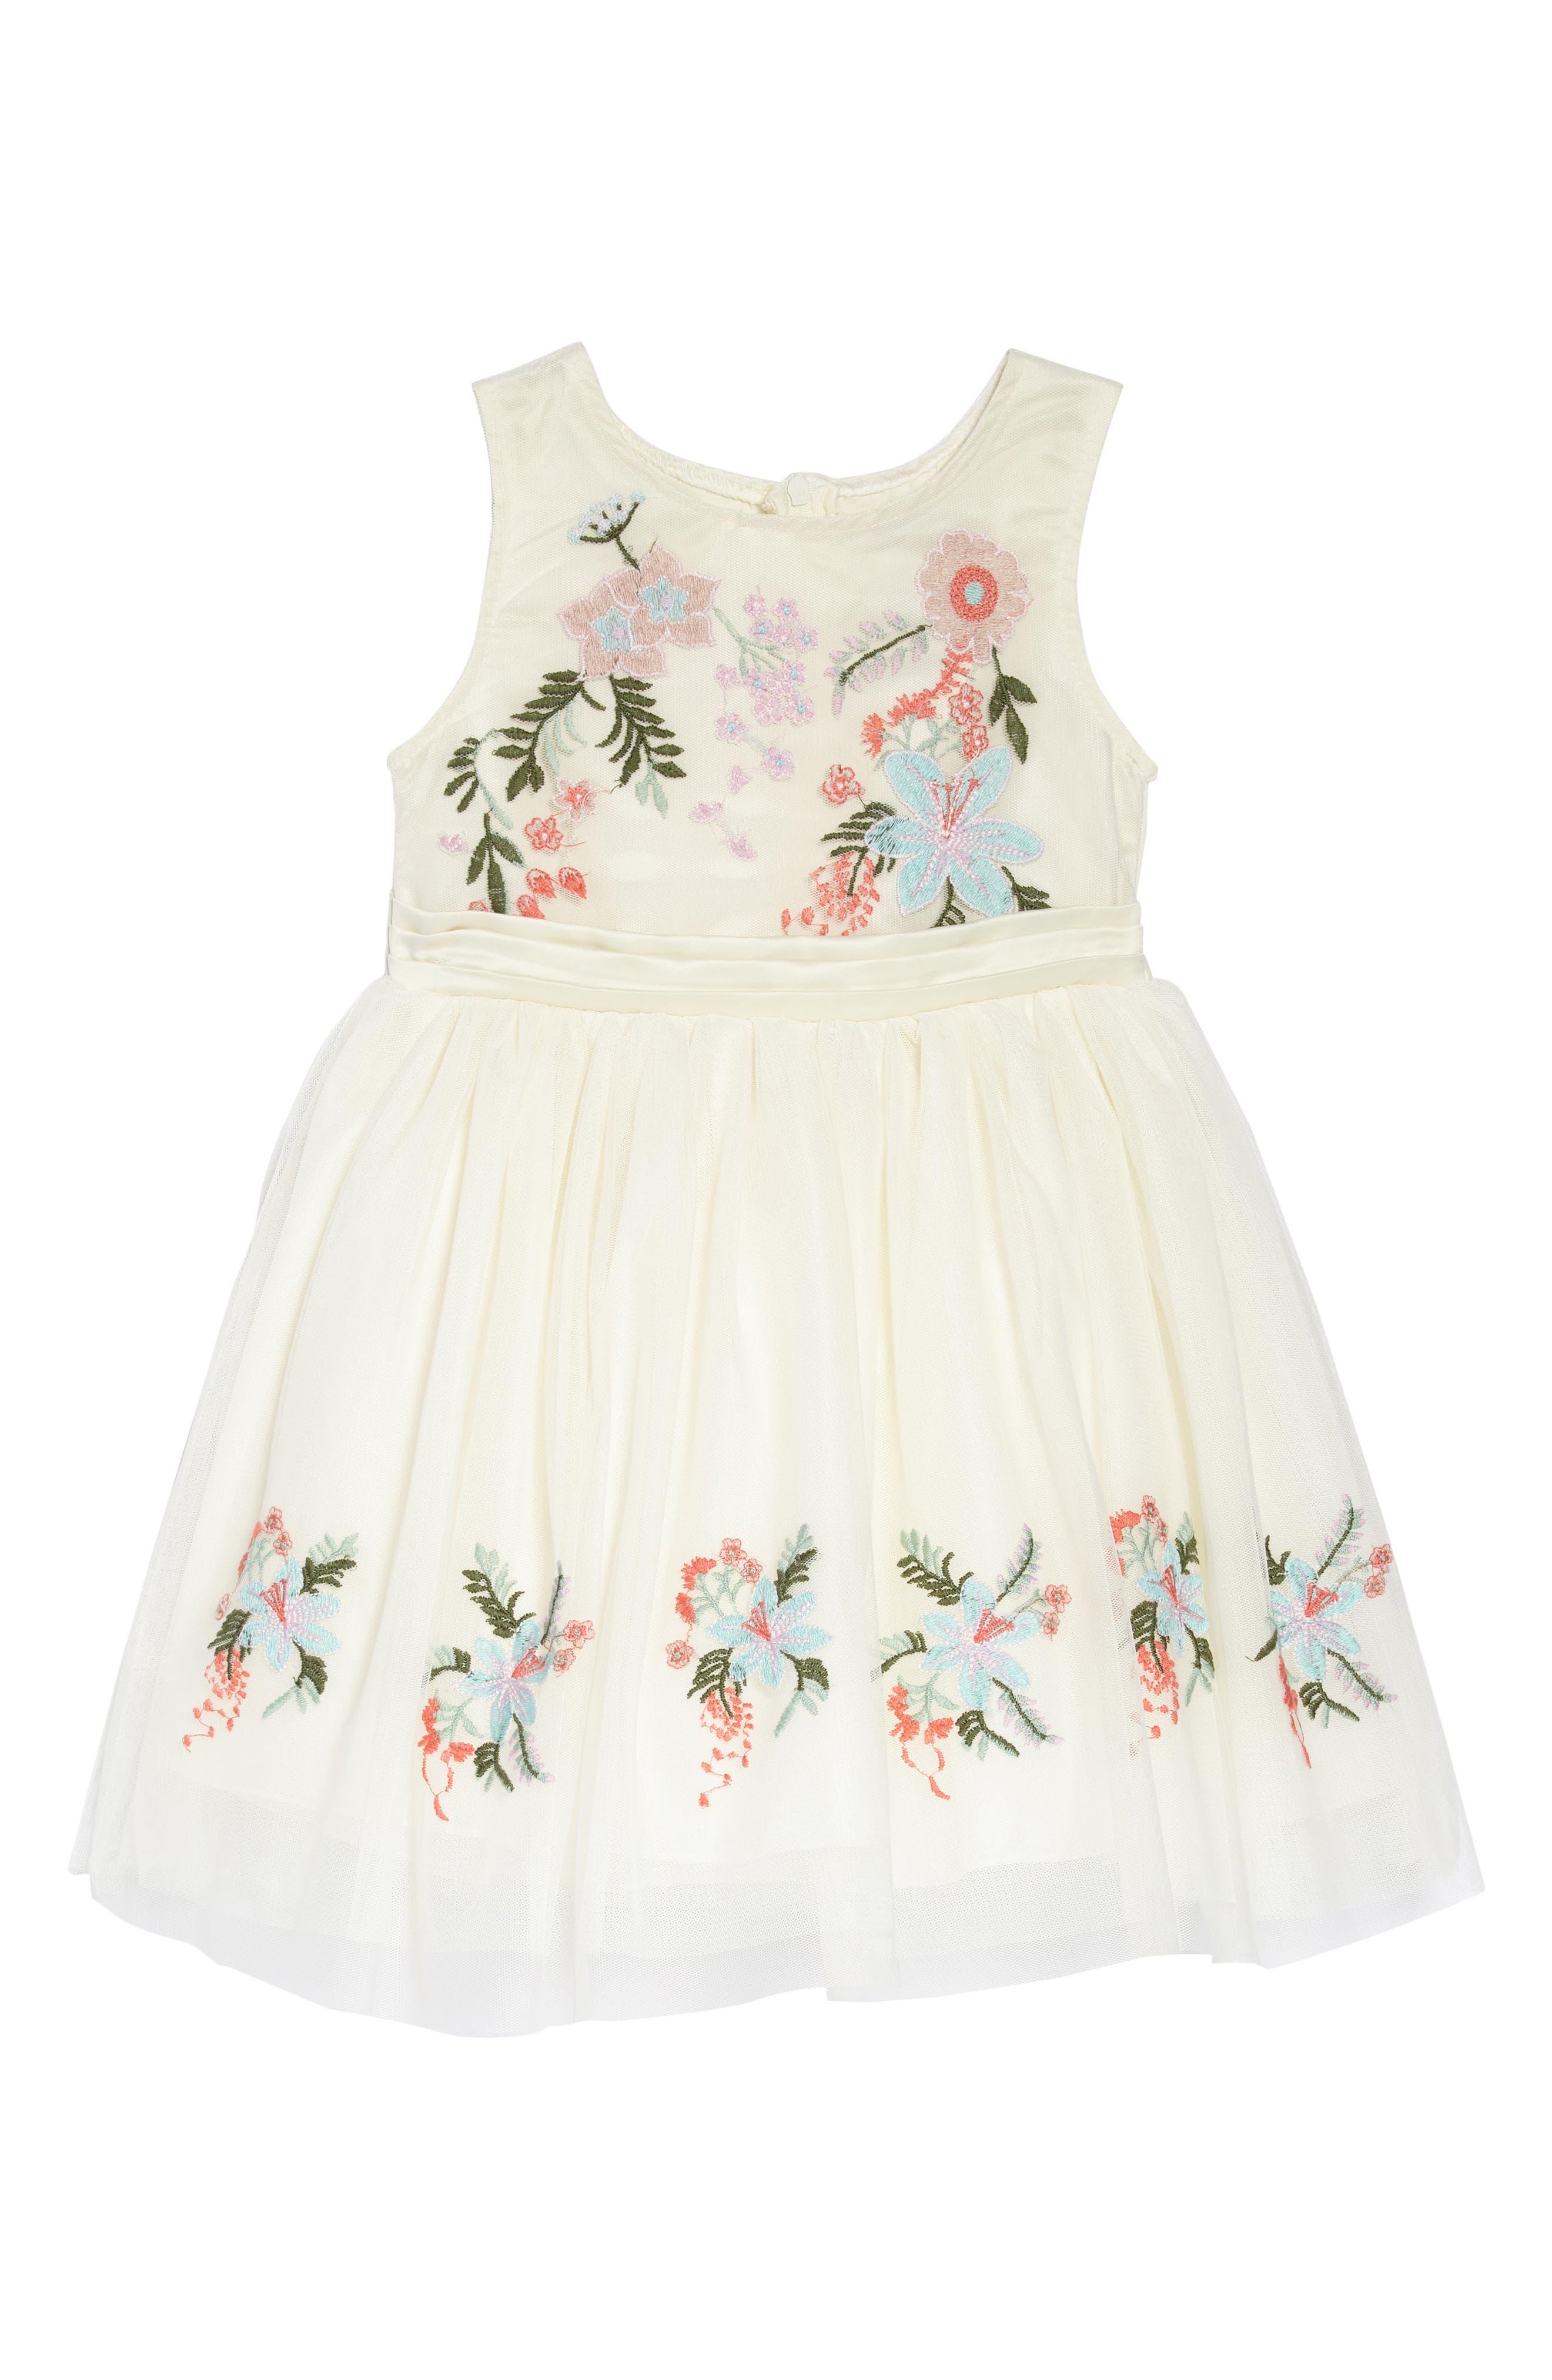 Alternate Image 1 Selected - Nanette Lepore Flower Embroidered Party Dress (Toddler Girls & Little Girls)